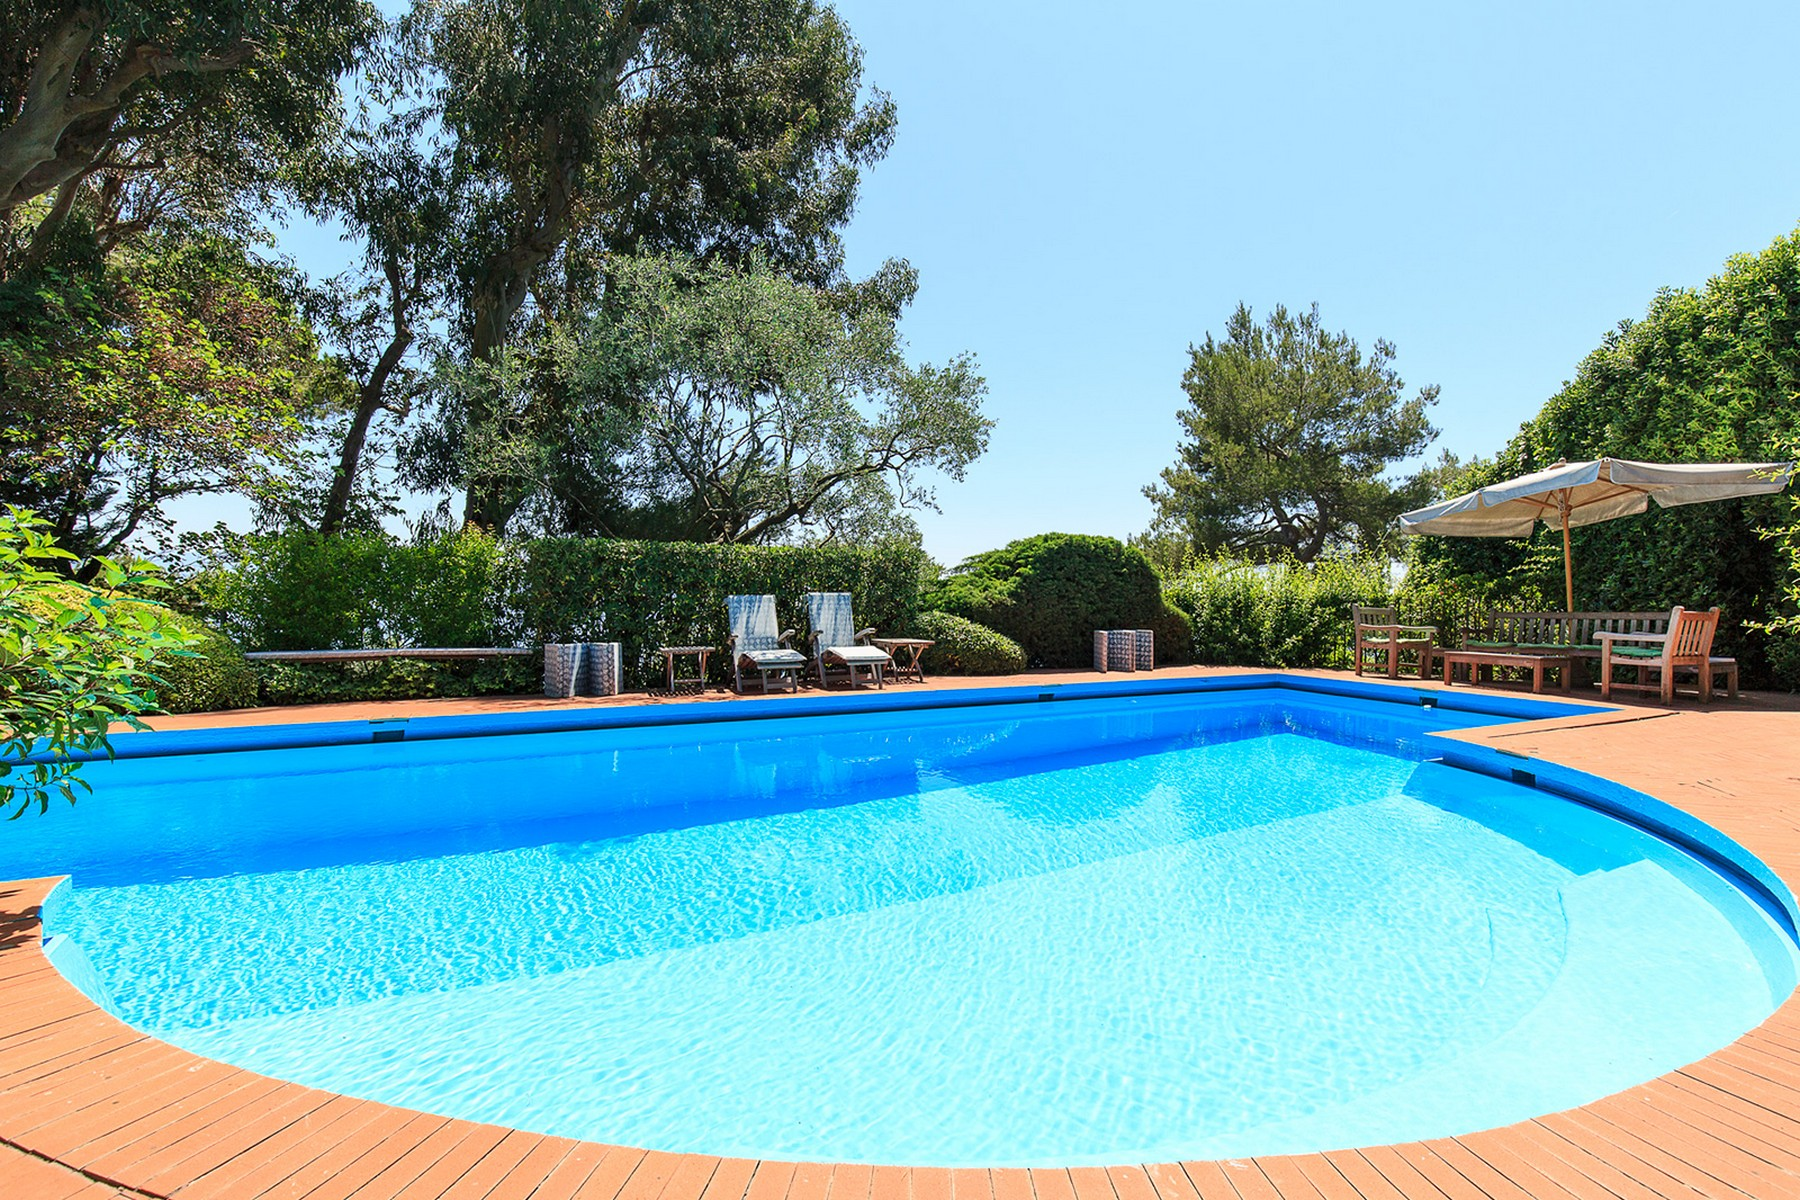 Villa in Vendita a Santa Margherita Ligure: 5 locali, 440 mq - Foto 22